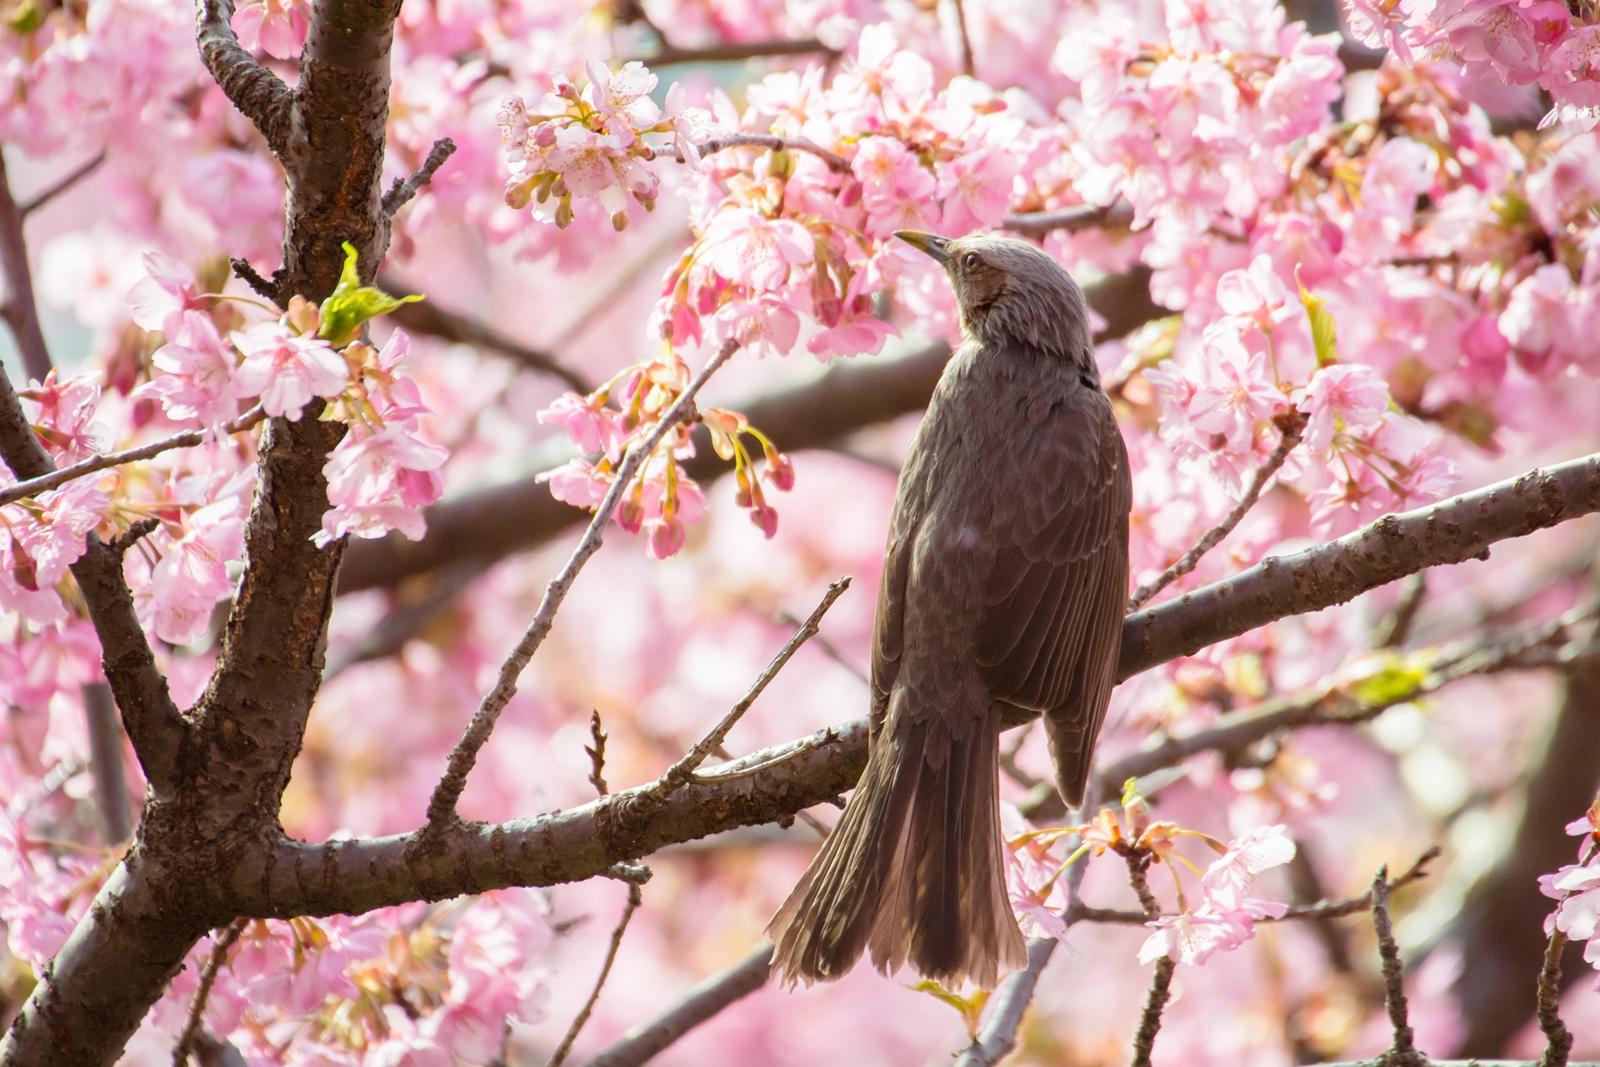 Photo: 桜色の輝き Cherry color brilliance.  陽が花びらを透かし 桜色の光が包み込む うっとりと 現を忘れる心地良きひととき  Kawazu cherry trees and Brown-eared Bulbul. (河津桜とヒヨドリ) #fujisakura #cooljapan #365cooljapanmay  #birdphotography #birds  #kawaii  Nikon D7100 SIGMA APO 50-500mm F5-6.3 DG OS HSM [ Day316, March 24th ]  小鳥の詩朗読 https://youtu.be/TpsSUlPACp4?list=PL2YtHGm0-R3qVsaqvQe9OYdJFCkI98wzF